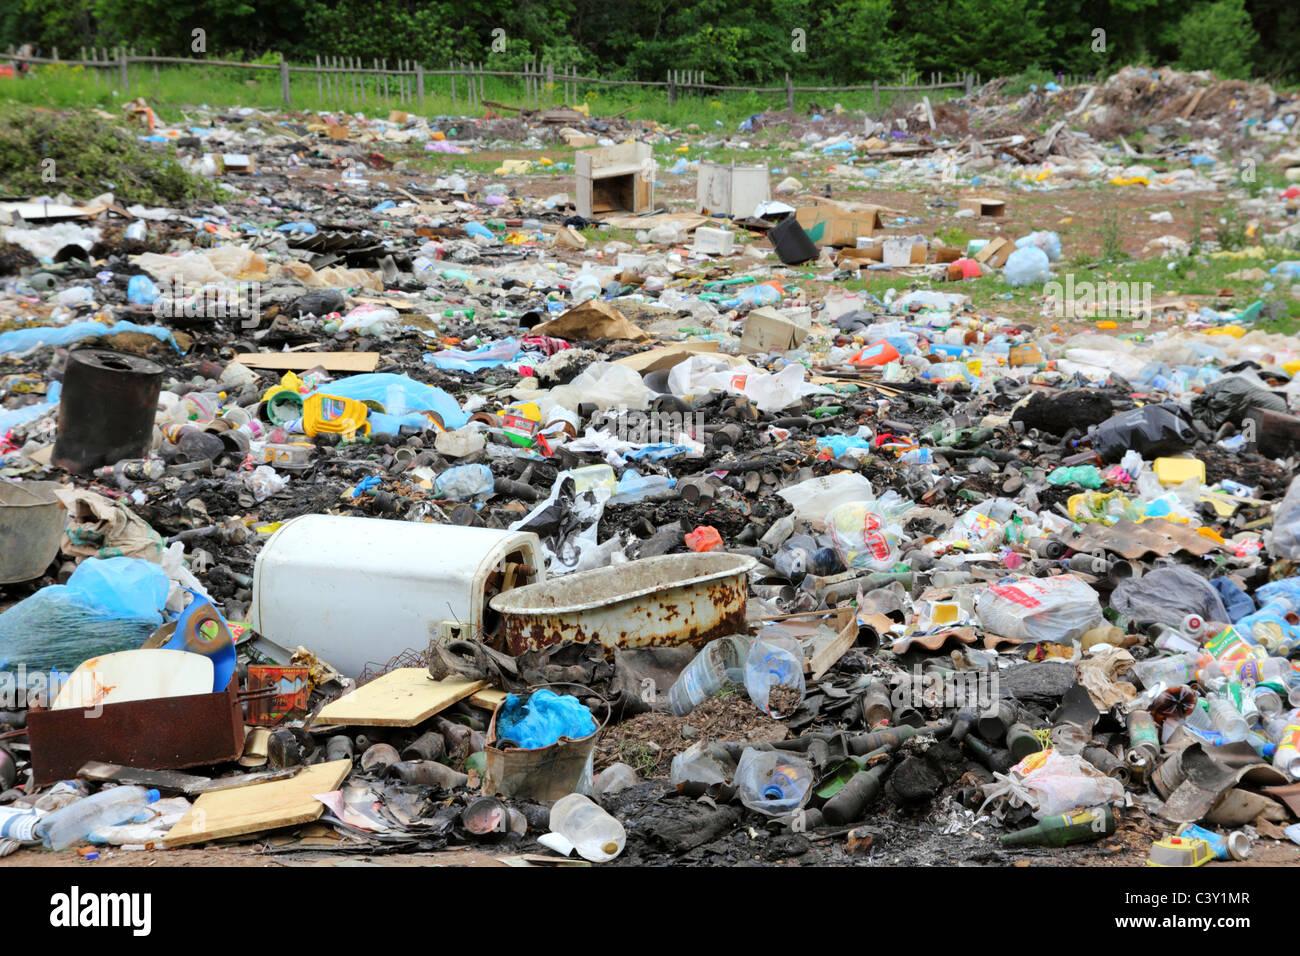 Global environment essay